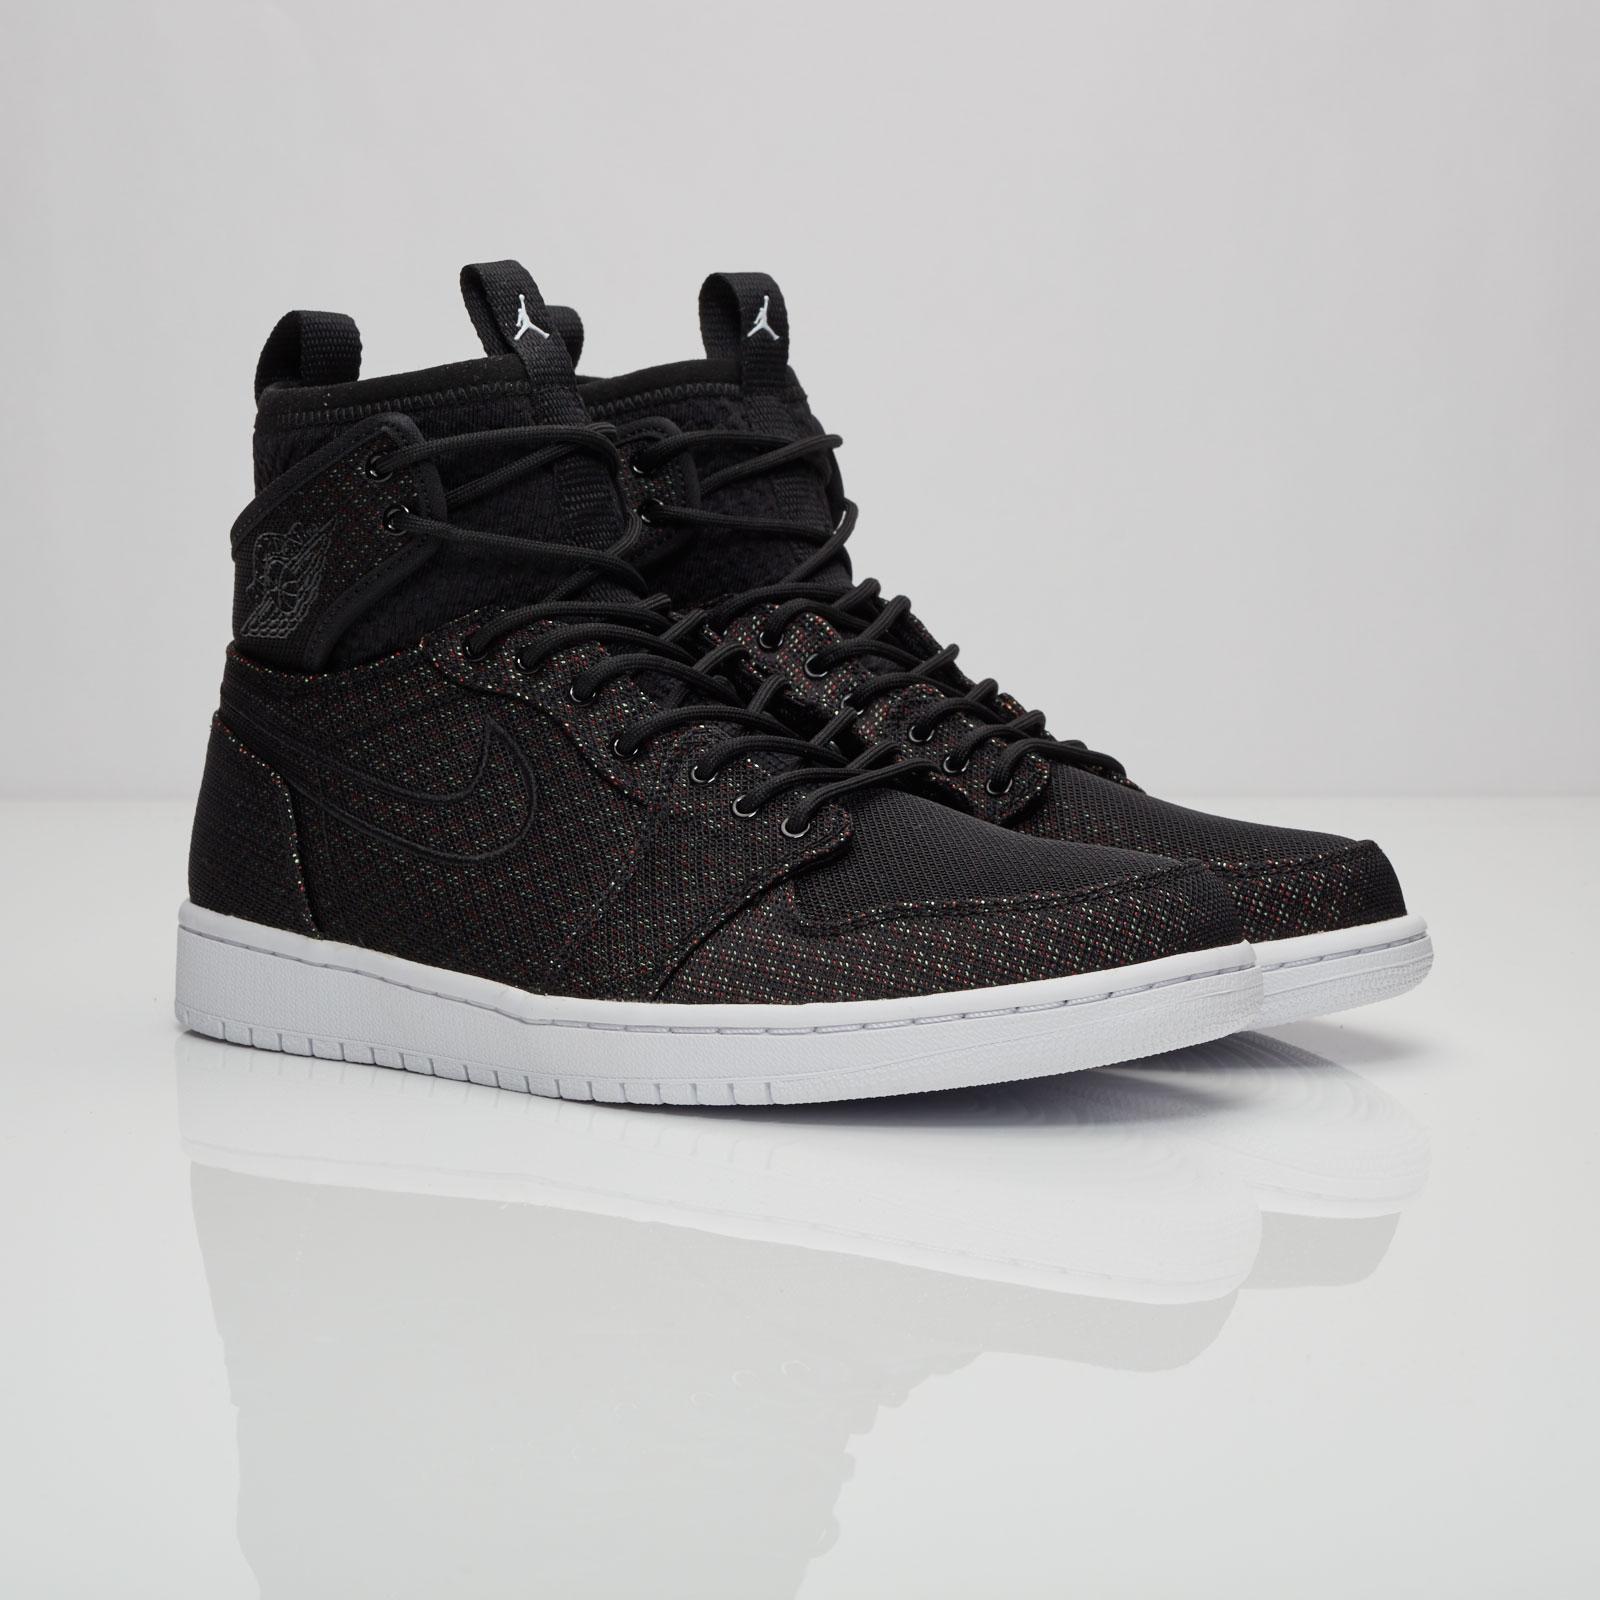 premium selection 2d4d1 c0cca Jordan Brand Air Jordan 1 Retro Ultra High